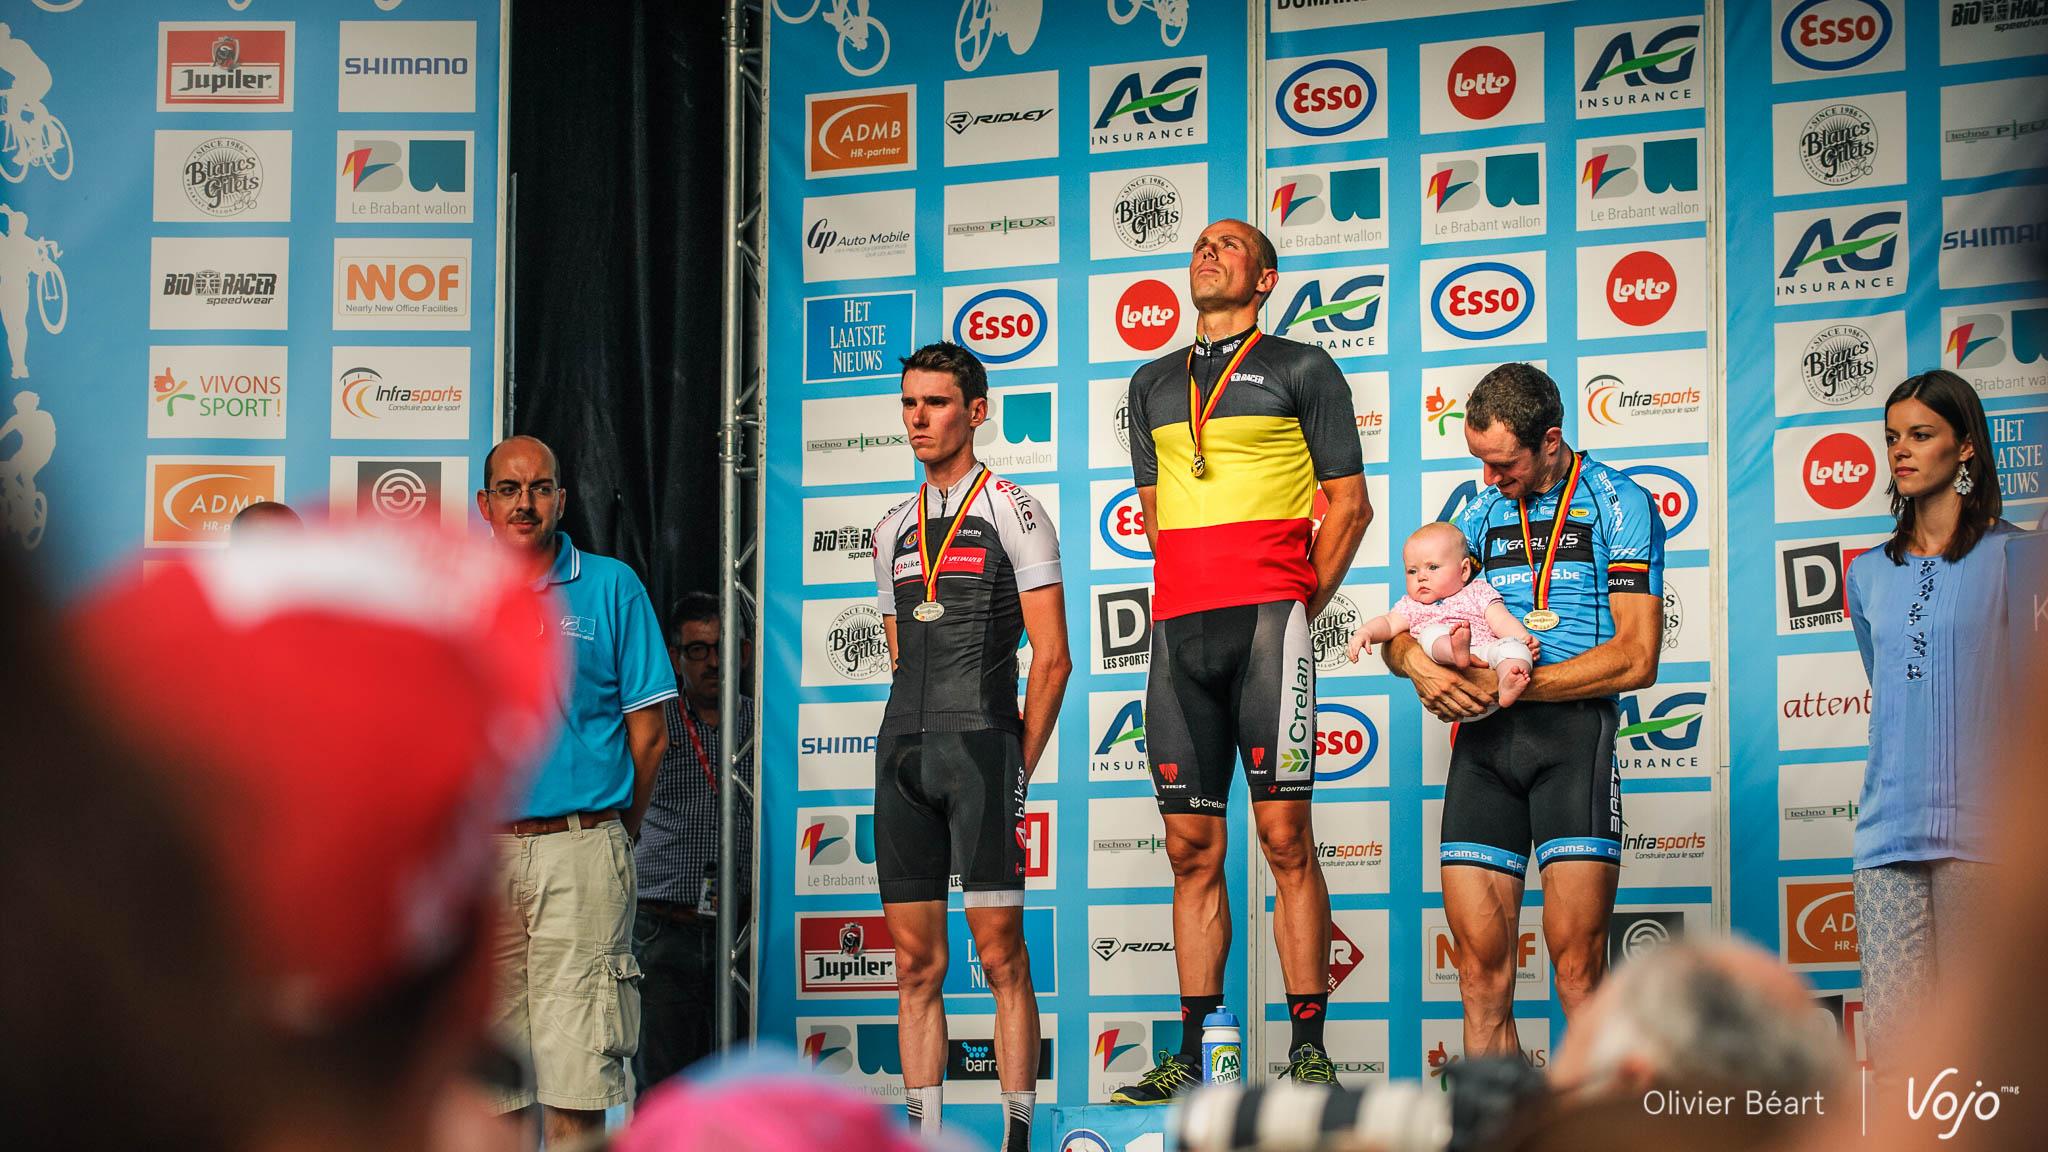 Championnat_Belgique_XC_BKXC_Ottignies_2015_Podium_Nys_Luyten_Bats_Copyright_CBortels_VojoMag-3